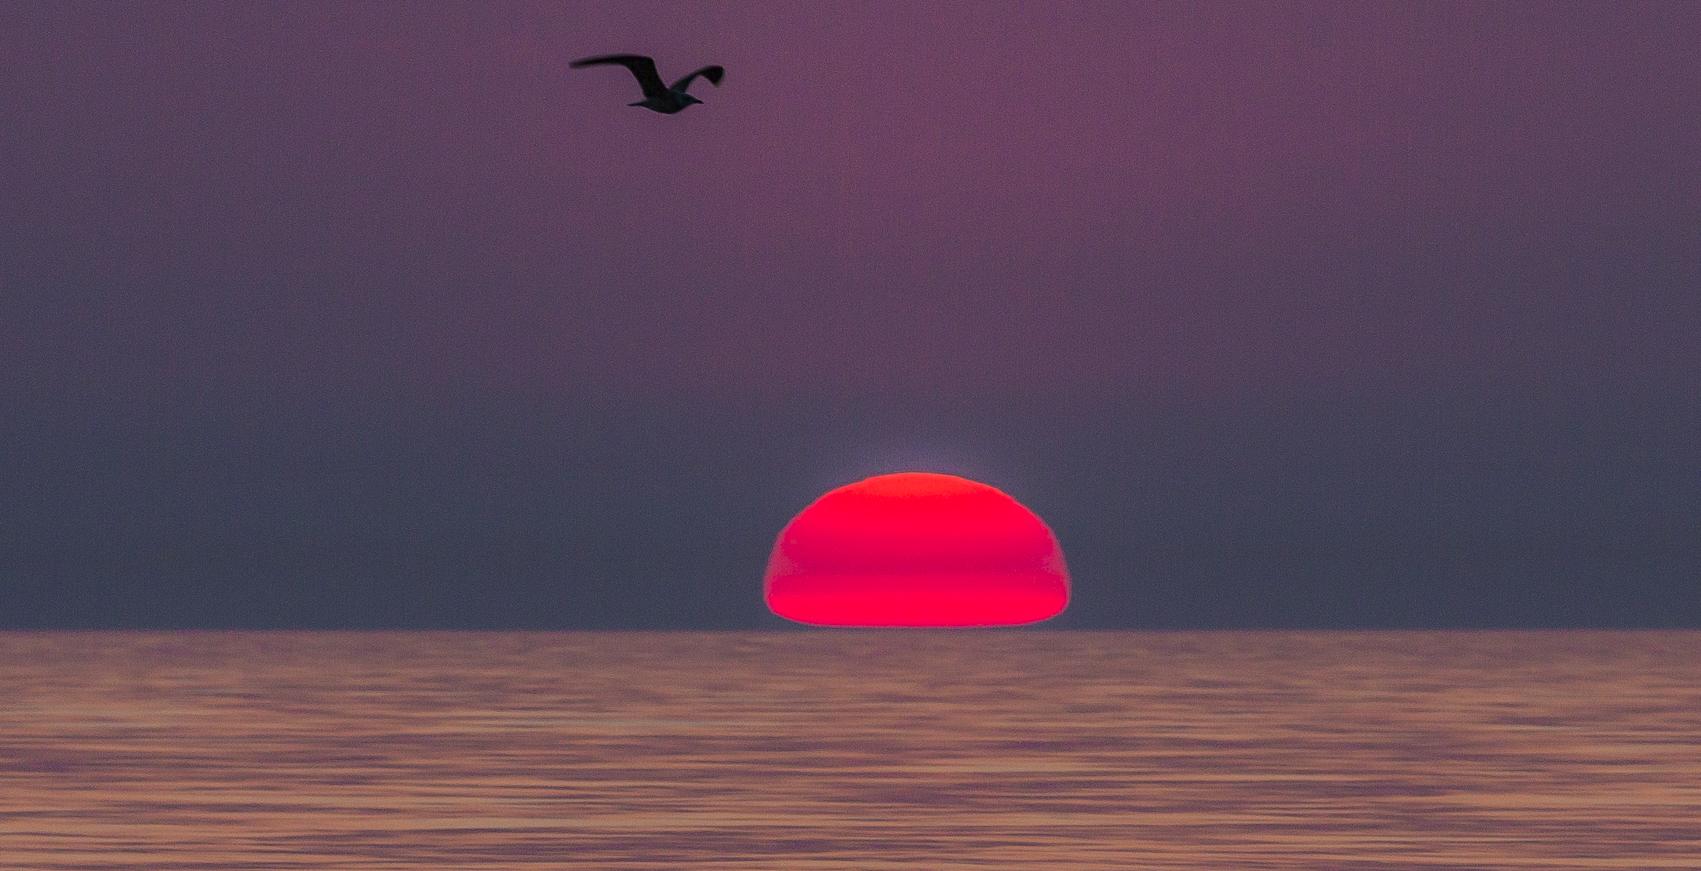 Sundowner FeWos Del Mar Zingst